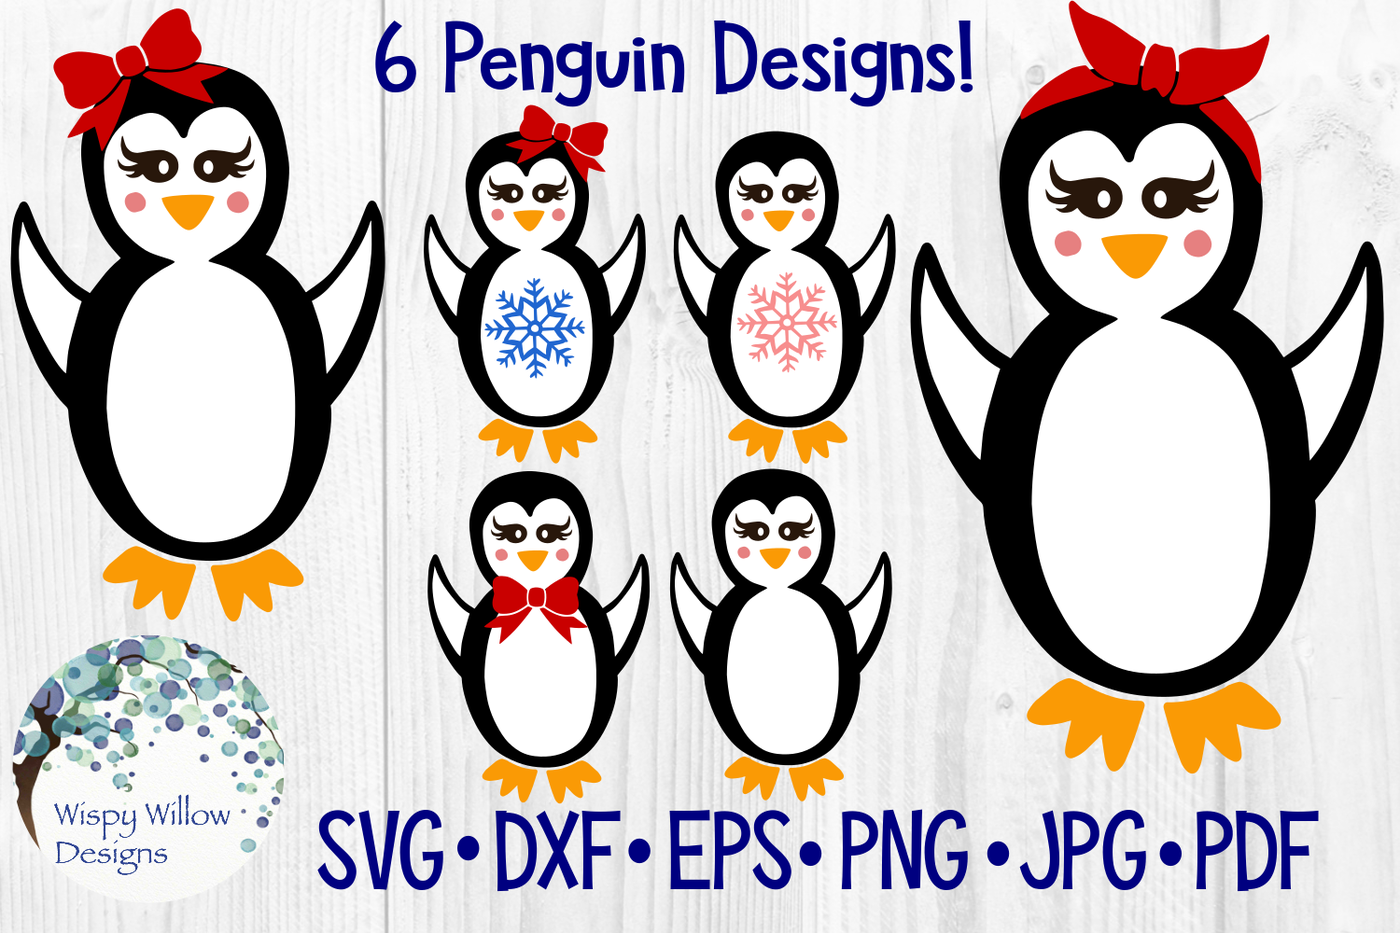 Girly Penguin Bundle Winter Christmas Svg Dxf Eps Png Jpg Pdf By